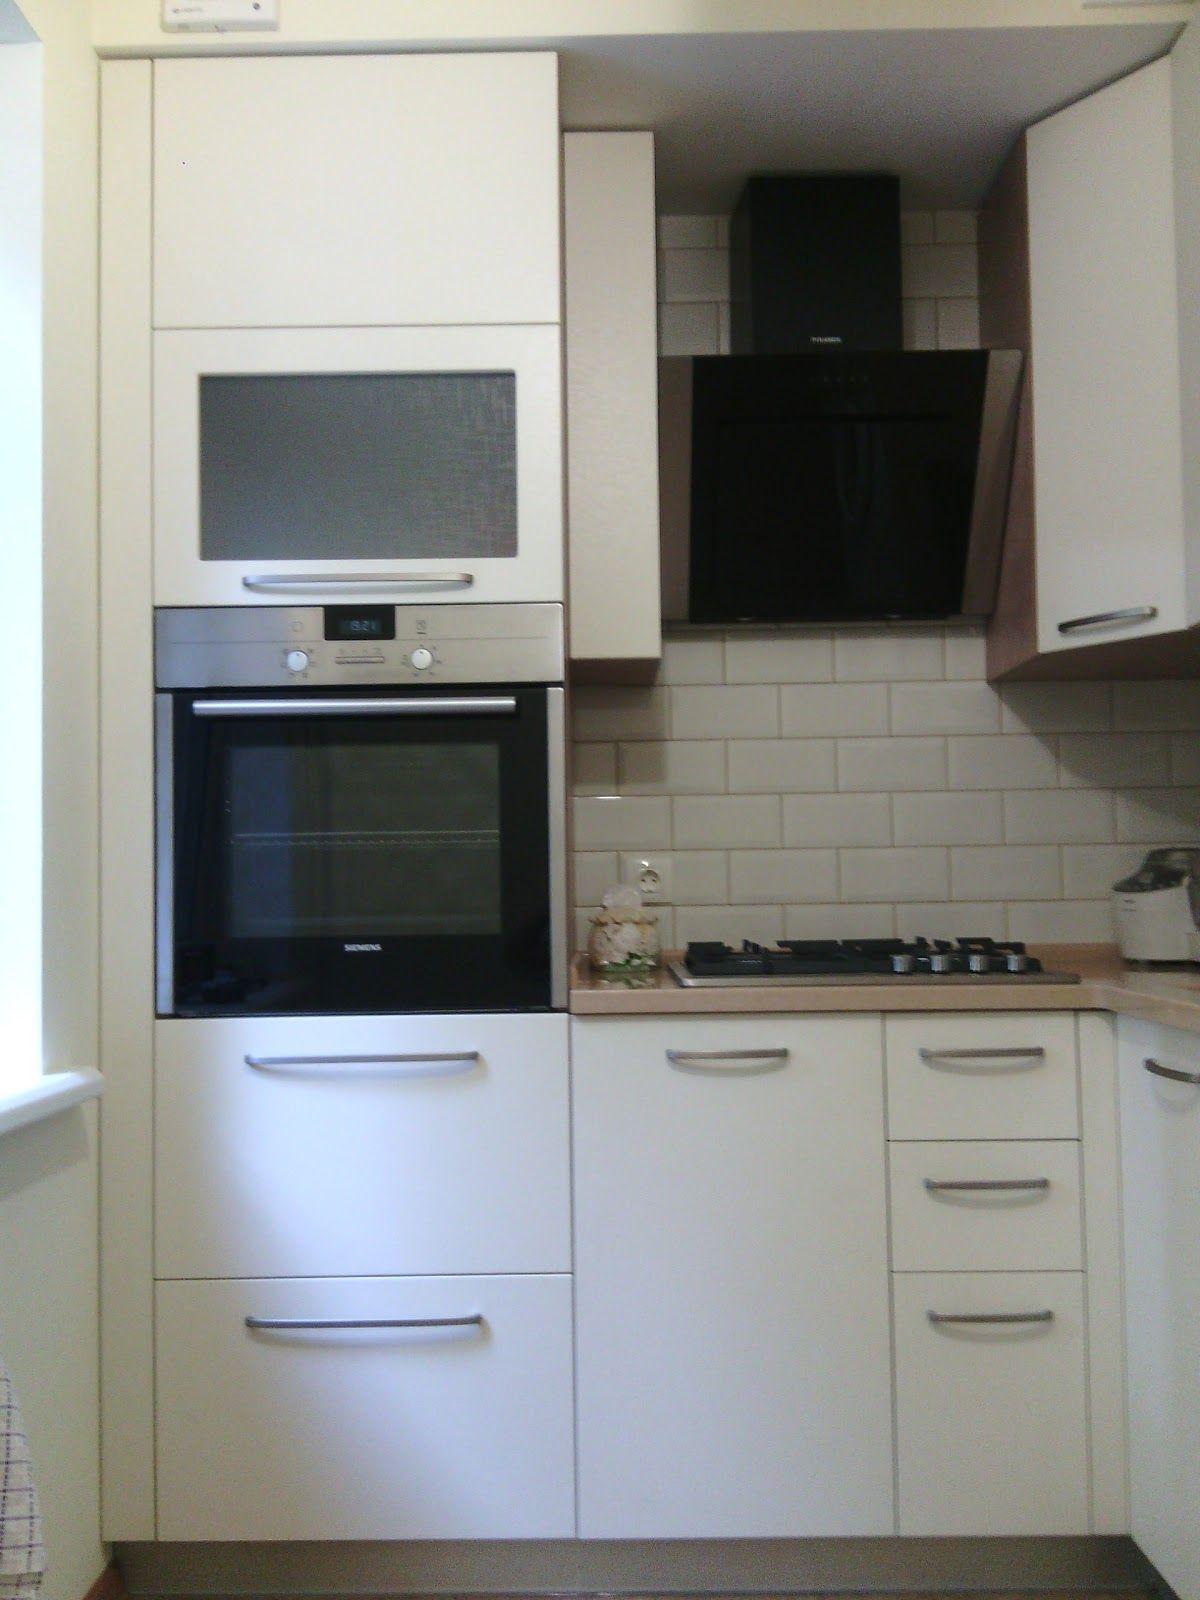 Картинки по запросу стиральная машина в пенале на кухне ...